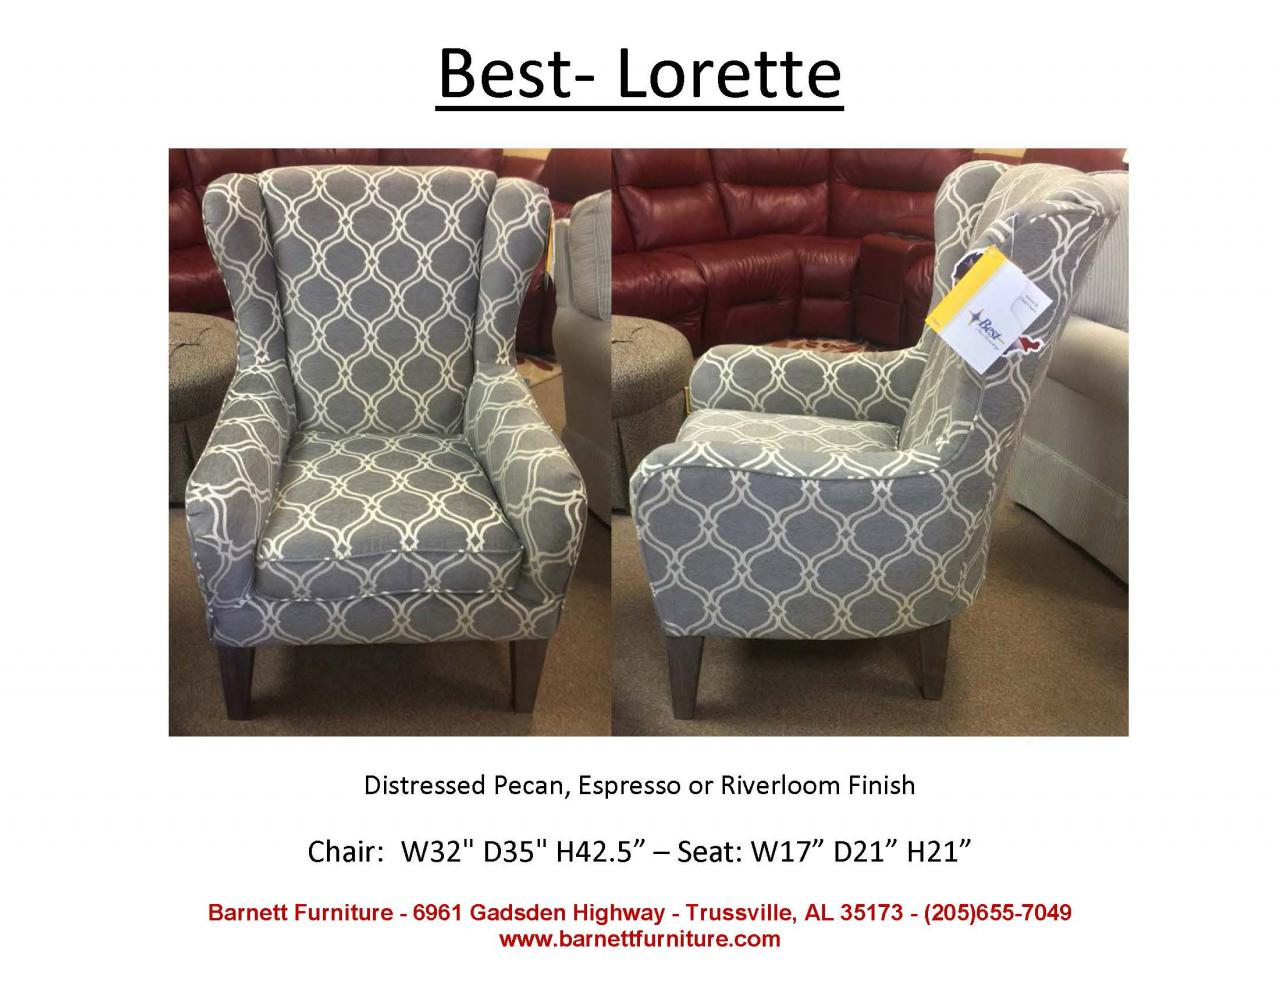 barnett furniture chairs